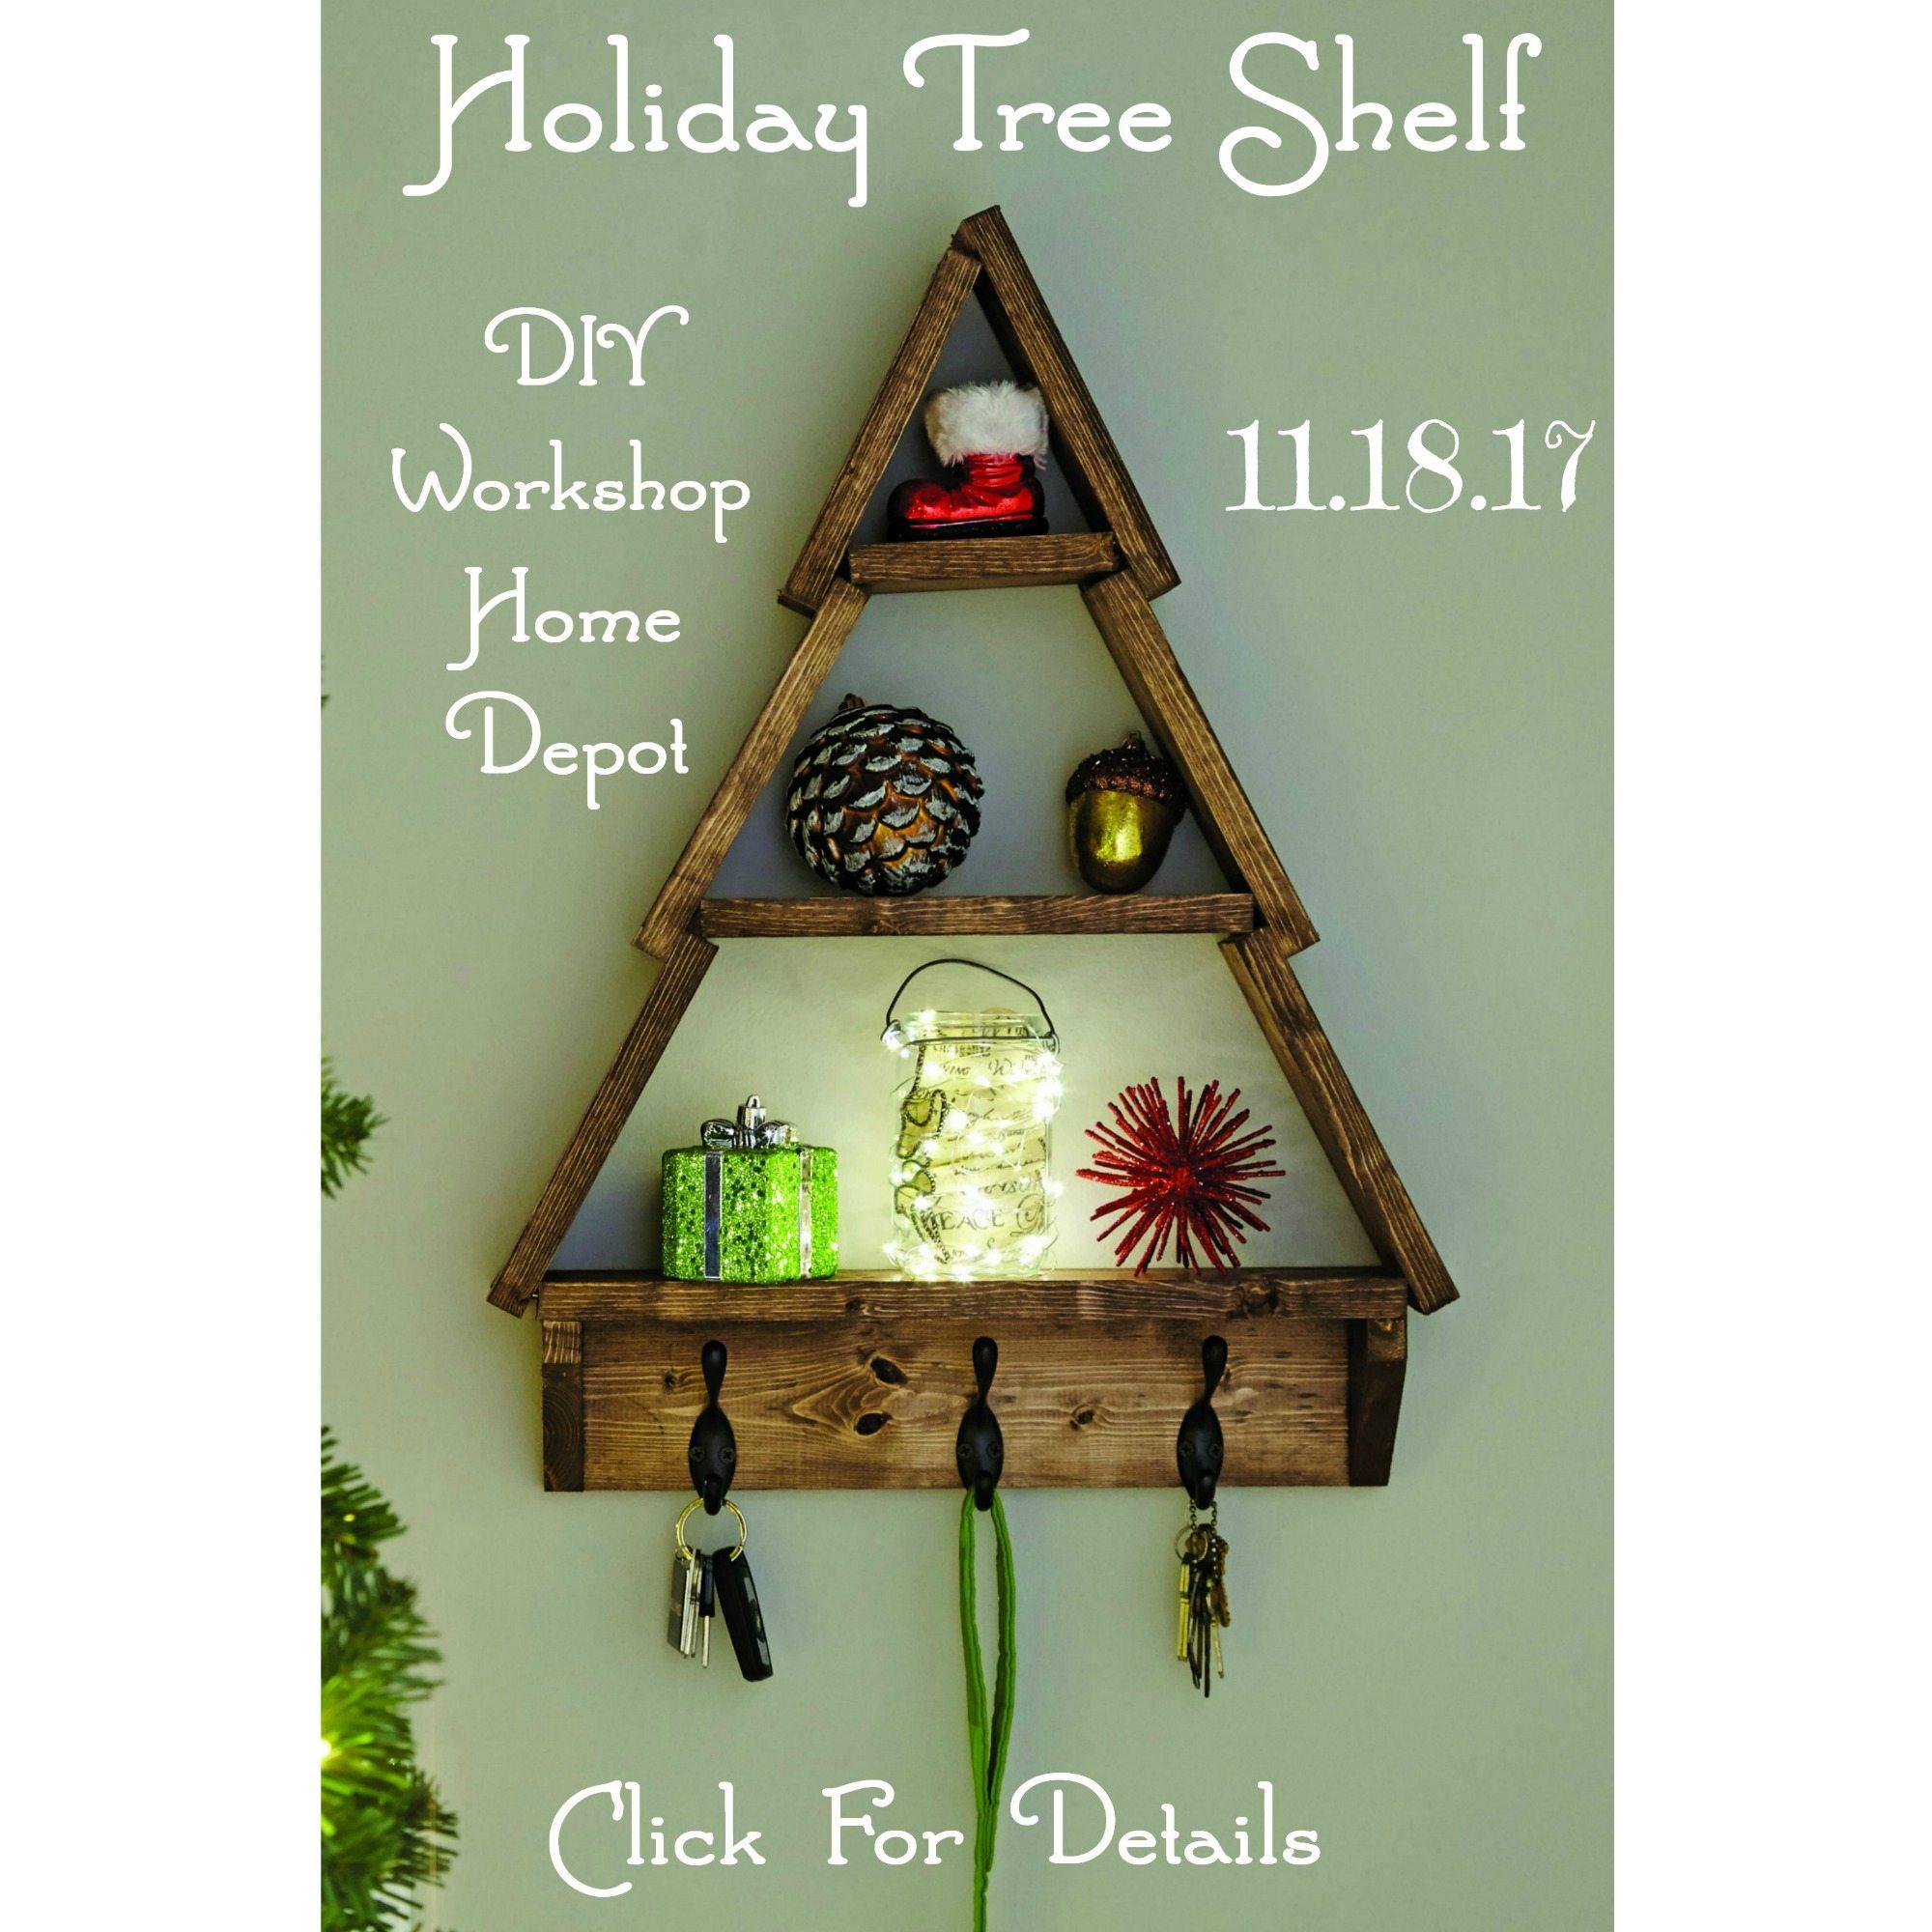 Holiday tree shelf home depot diy workshop november 2017 for Tree of life bookshelf